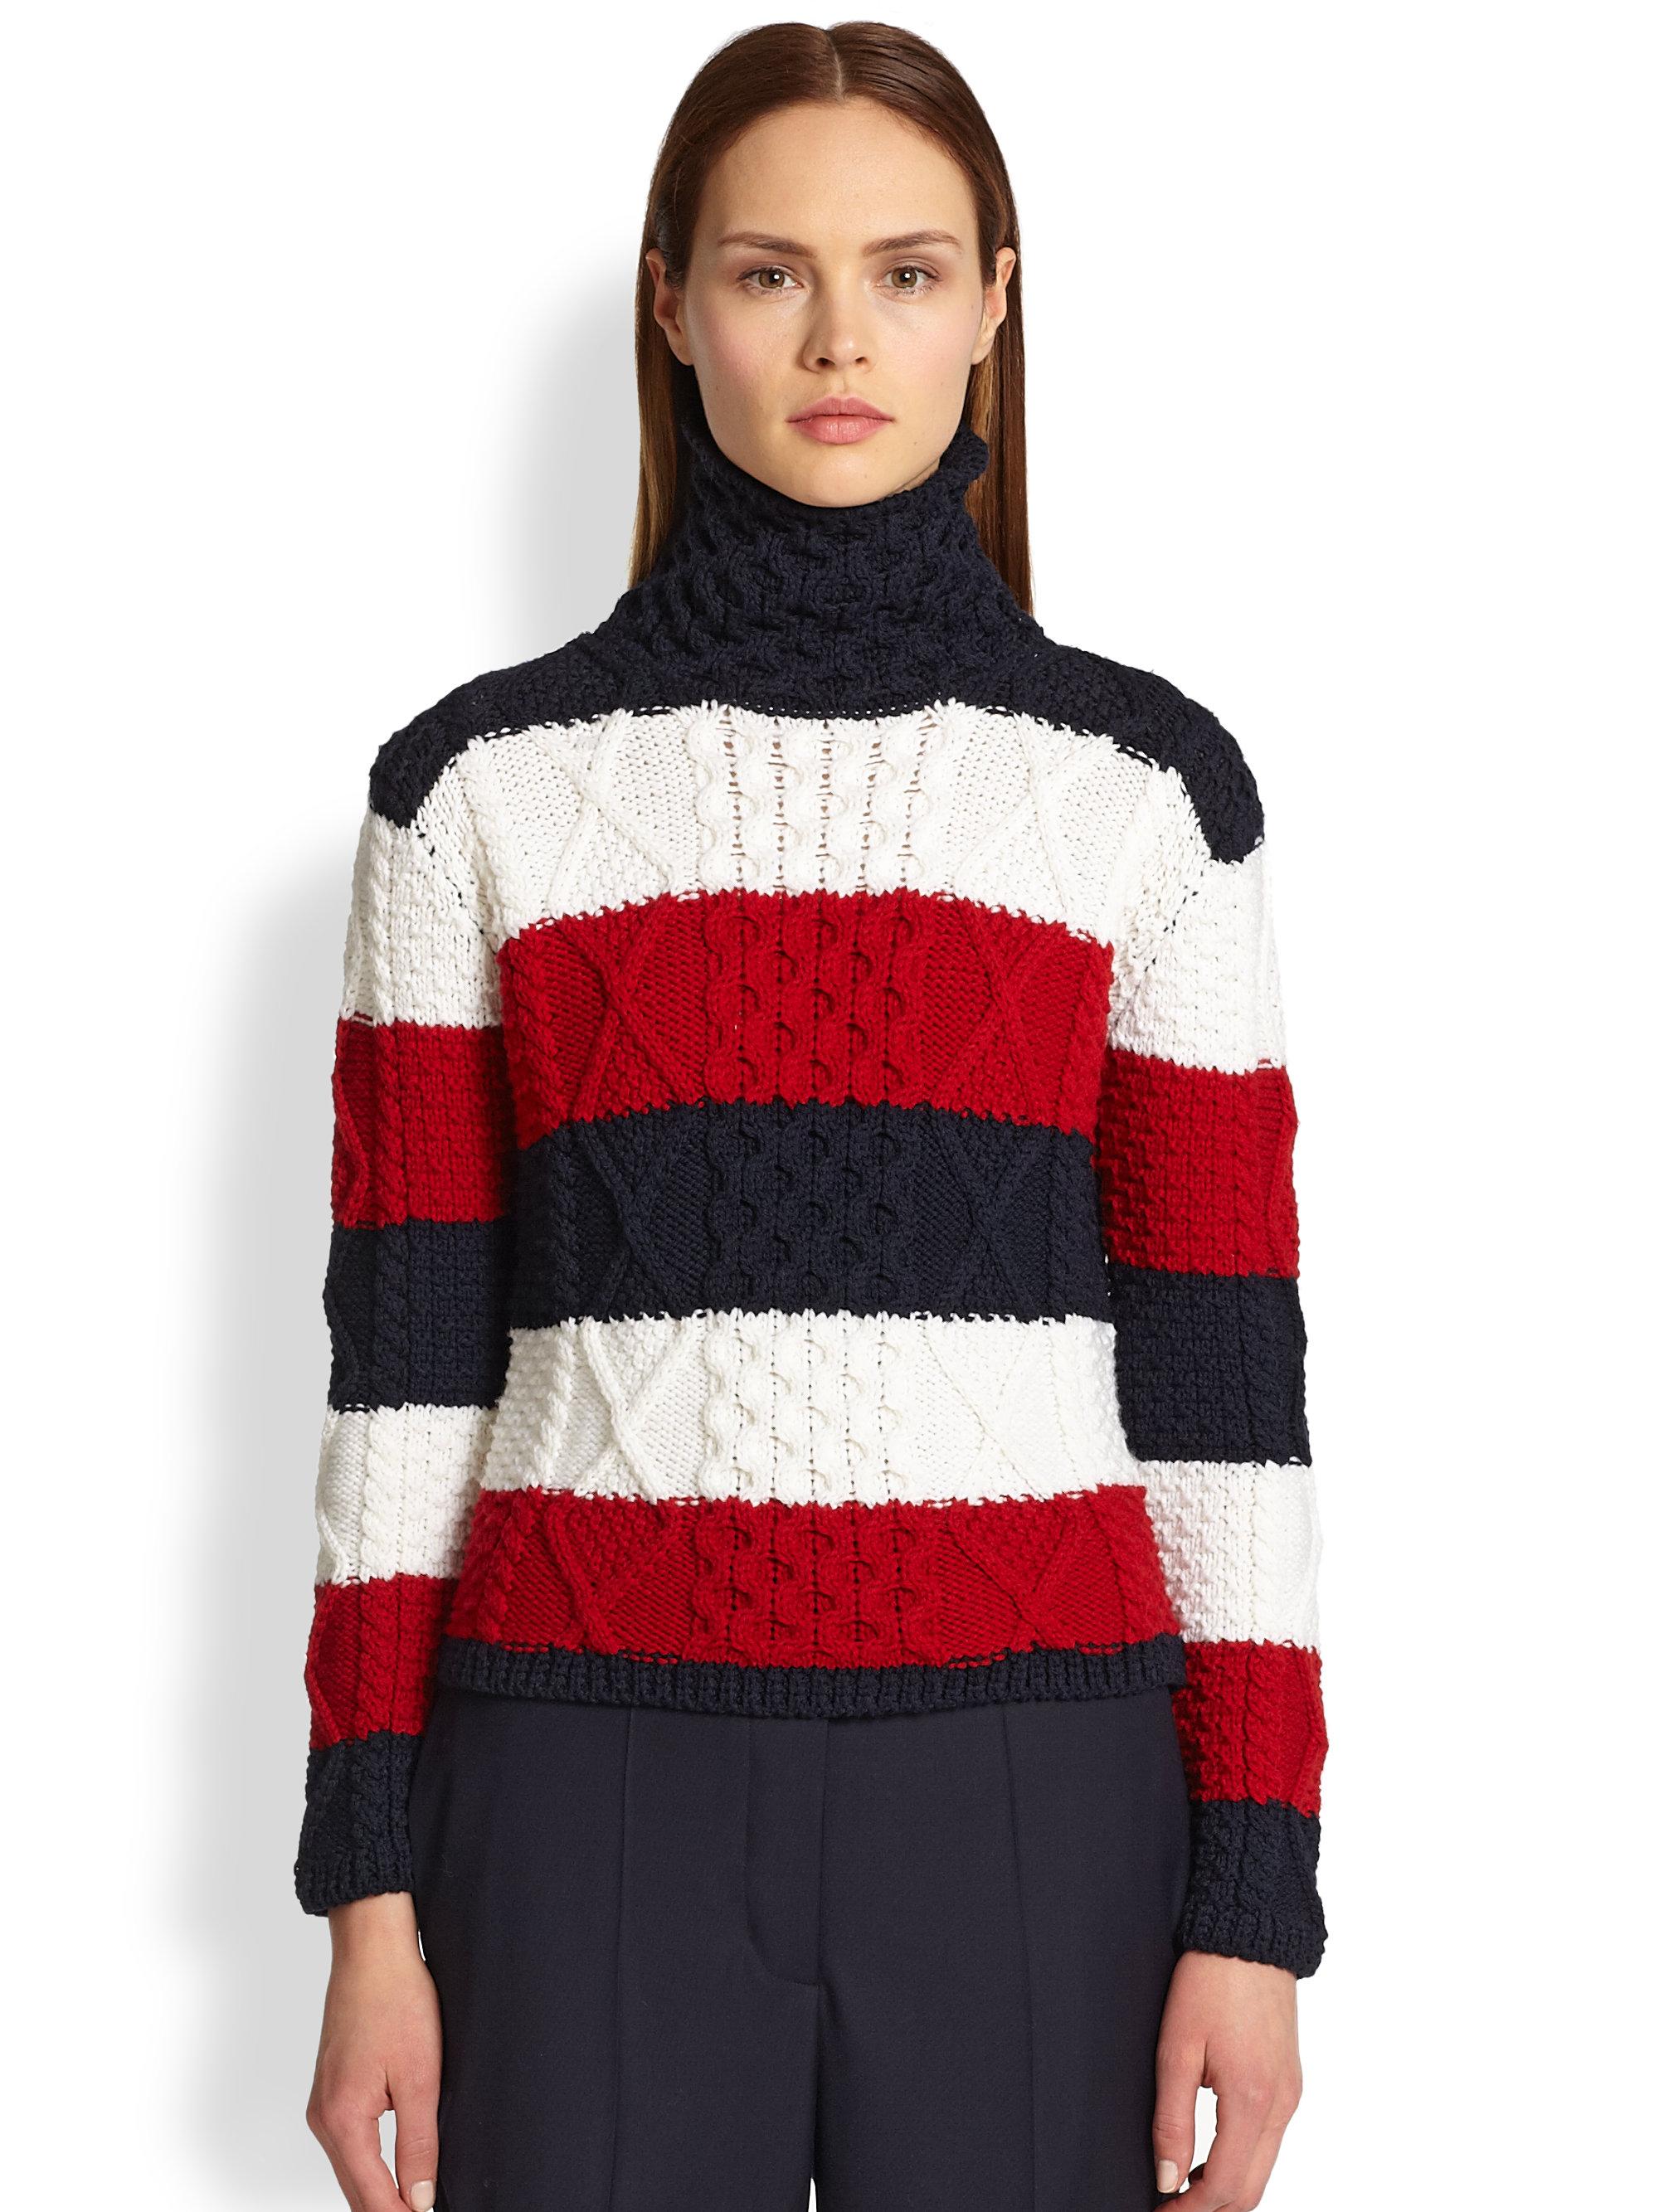 Thom browne Aran Wool Tristripe Turtleneck Sweater in Red | Lyst